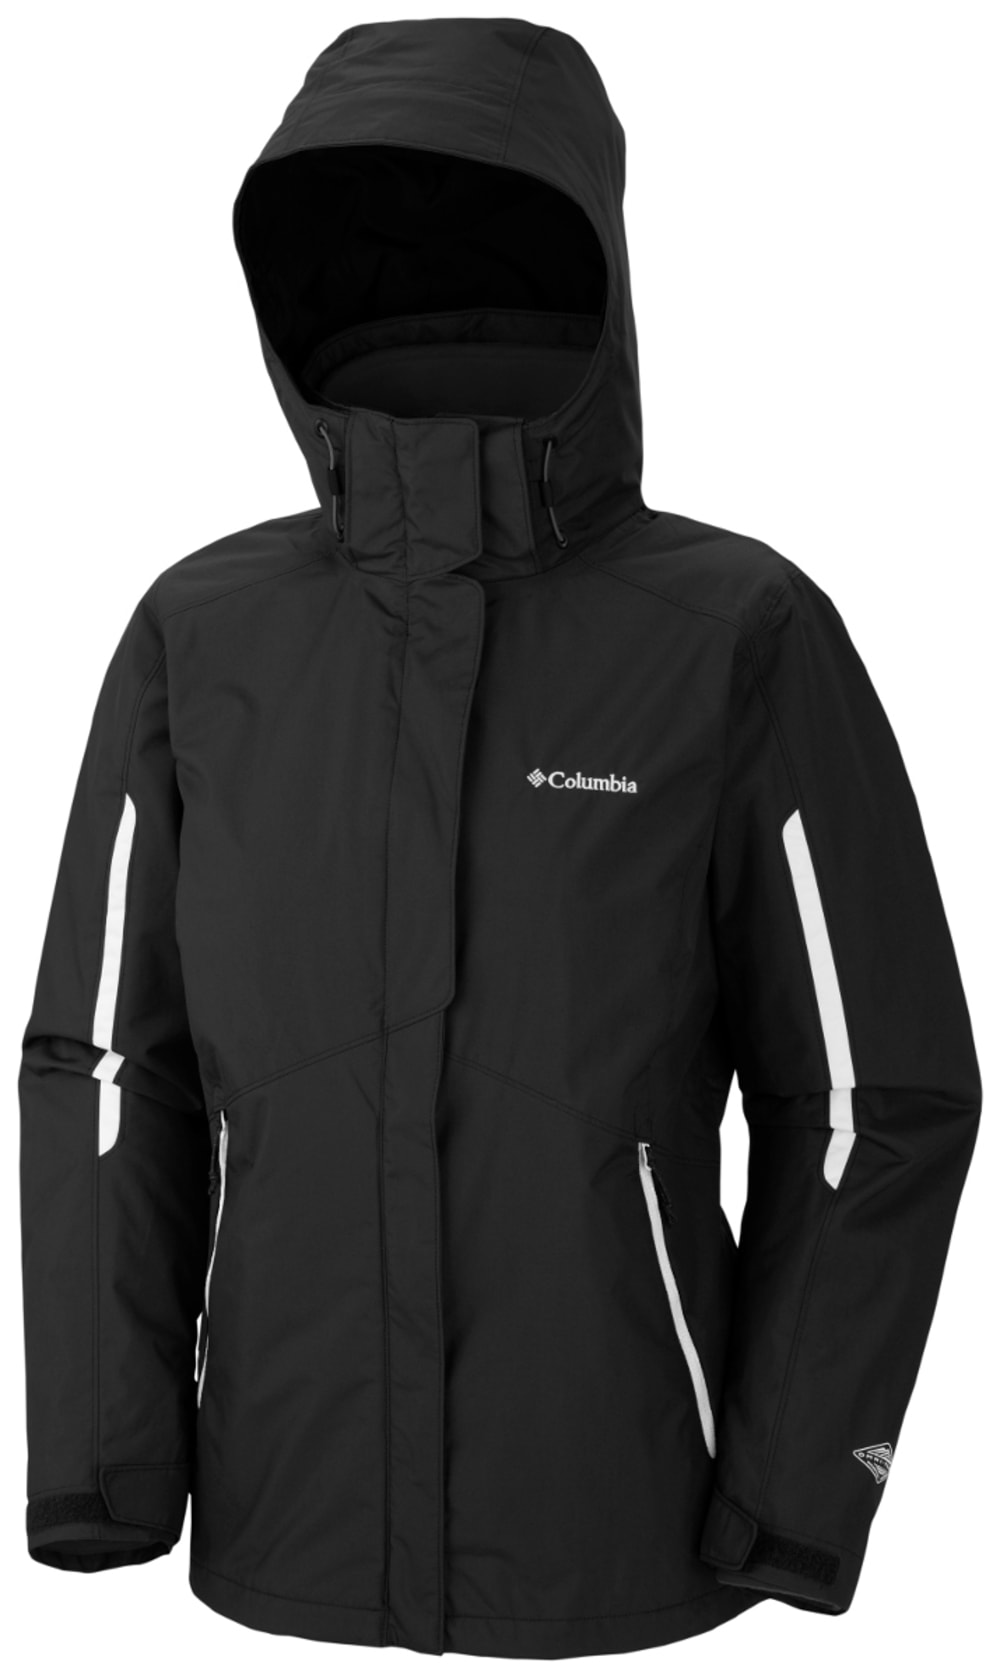 COLUMBIA Women's Bugaboo™ Interchange Jacket - 010-BLACK/WHITE